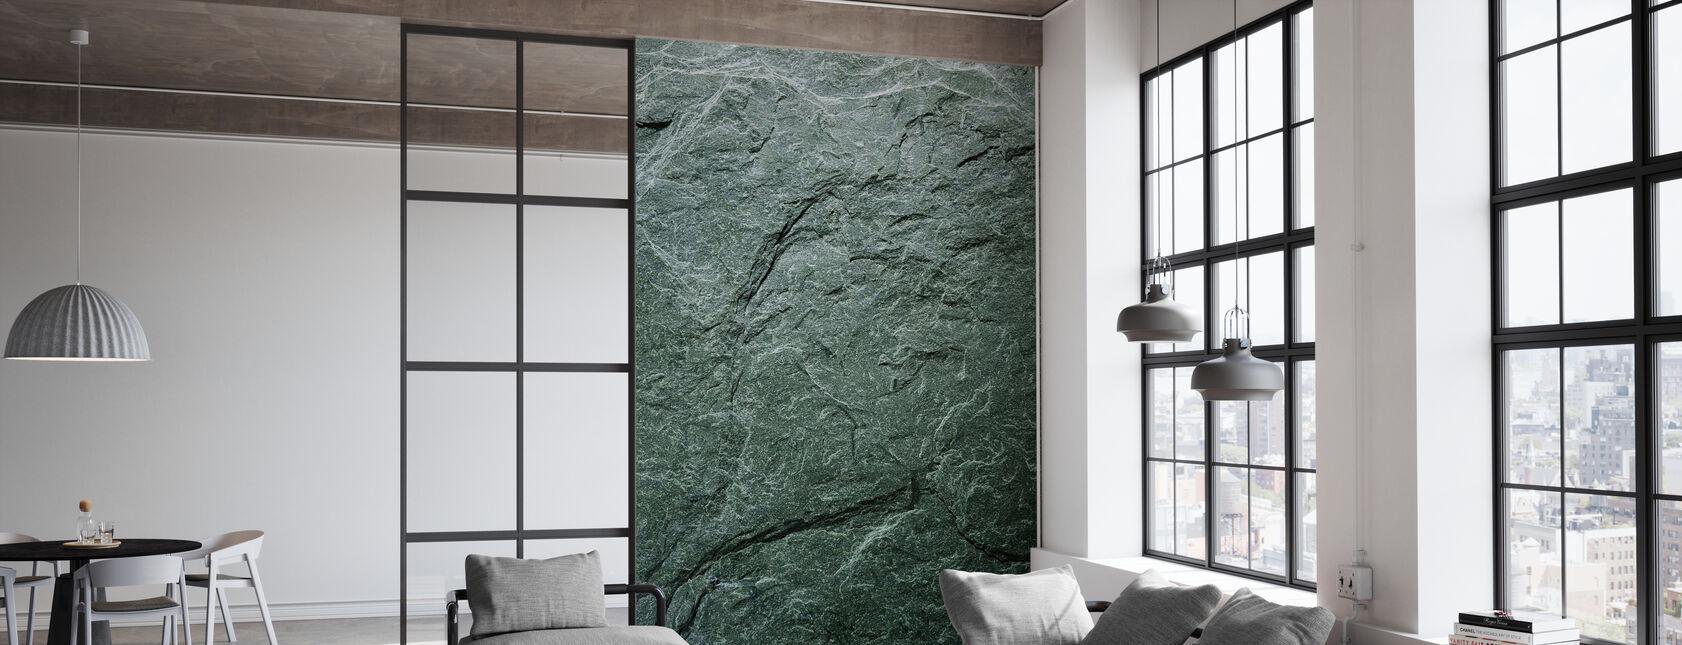 Greengray Slate - Wallpaper - Office